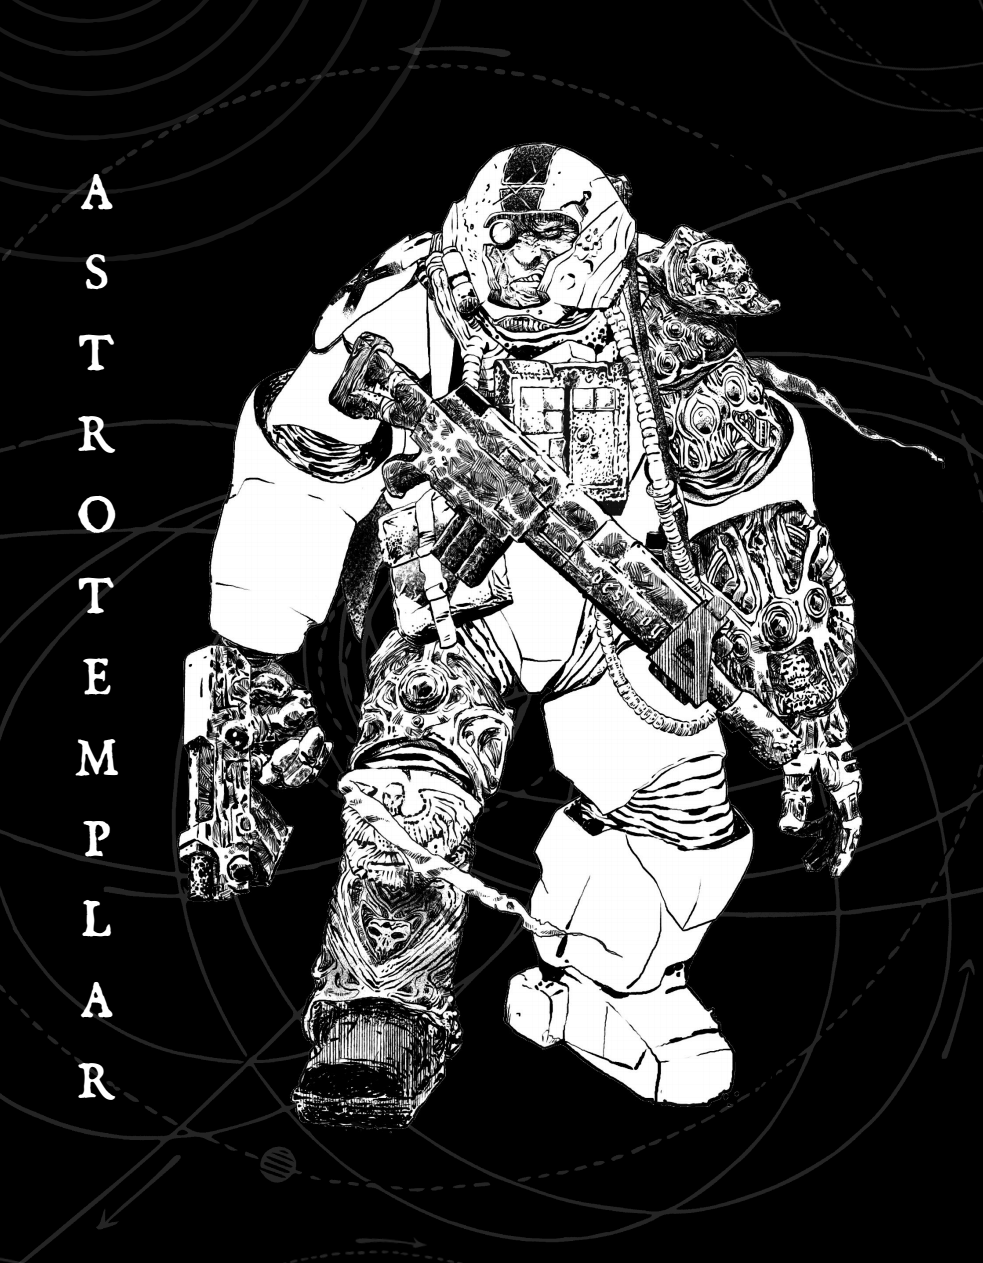 Astrotemplar